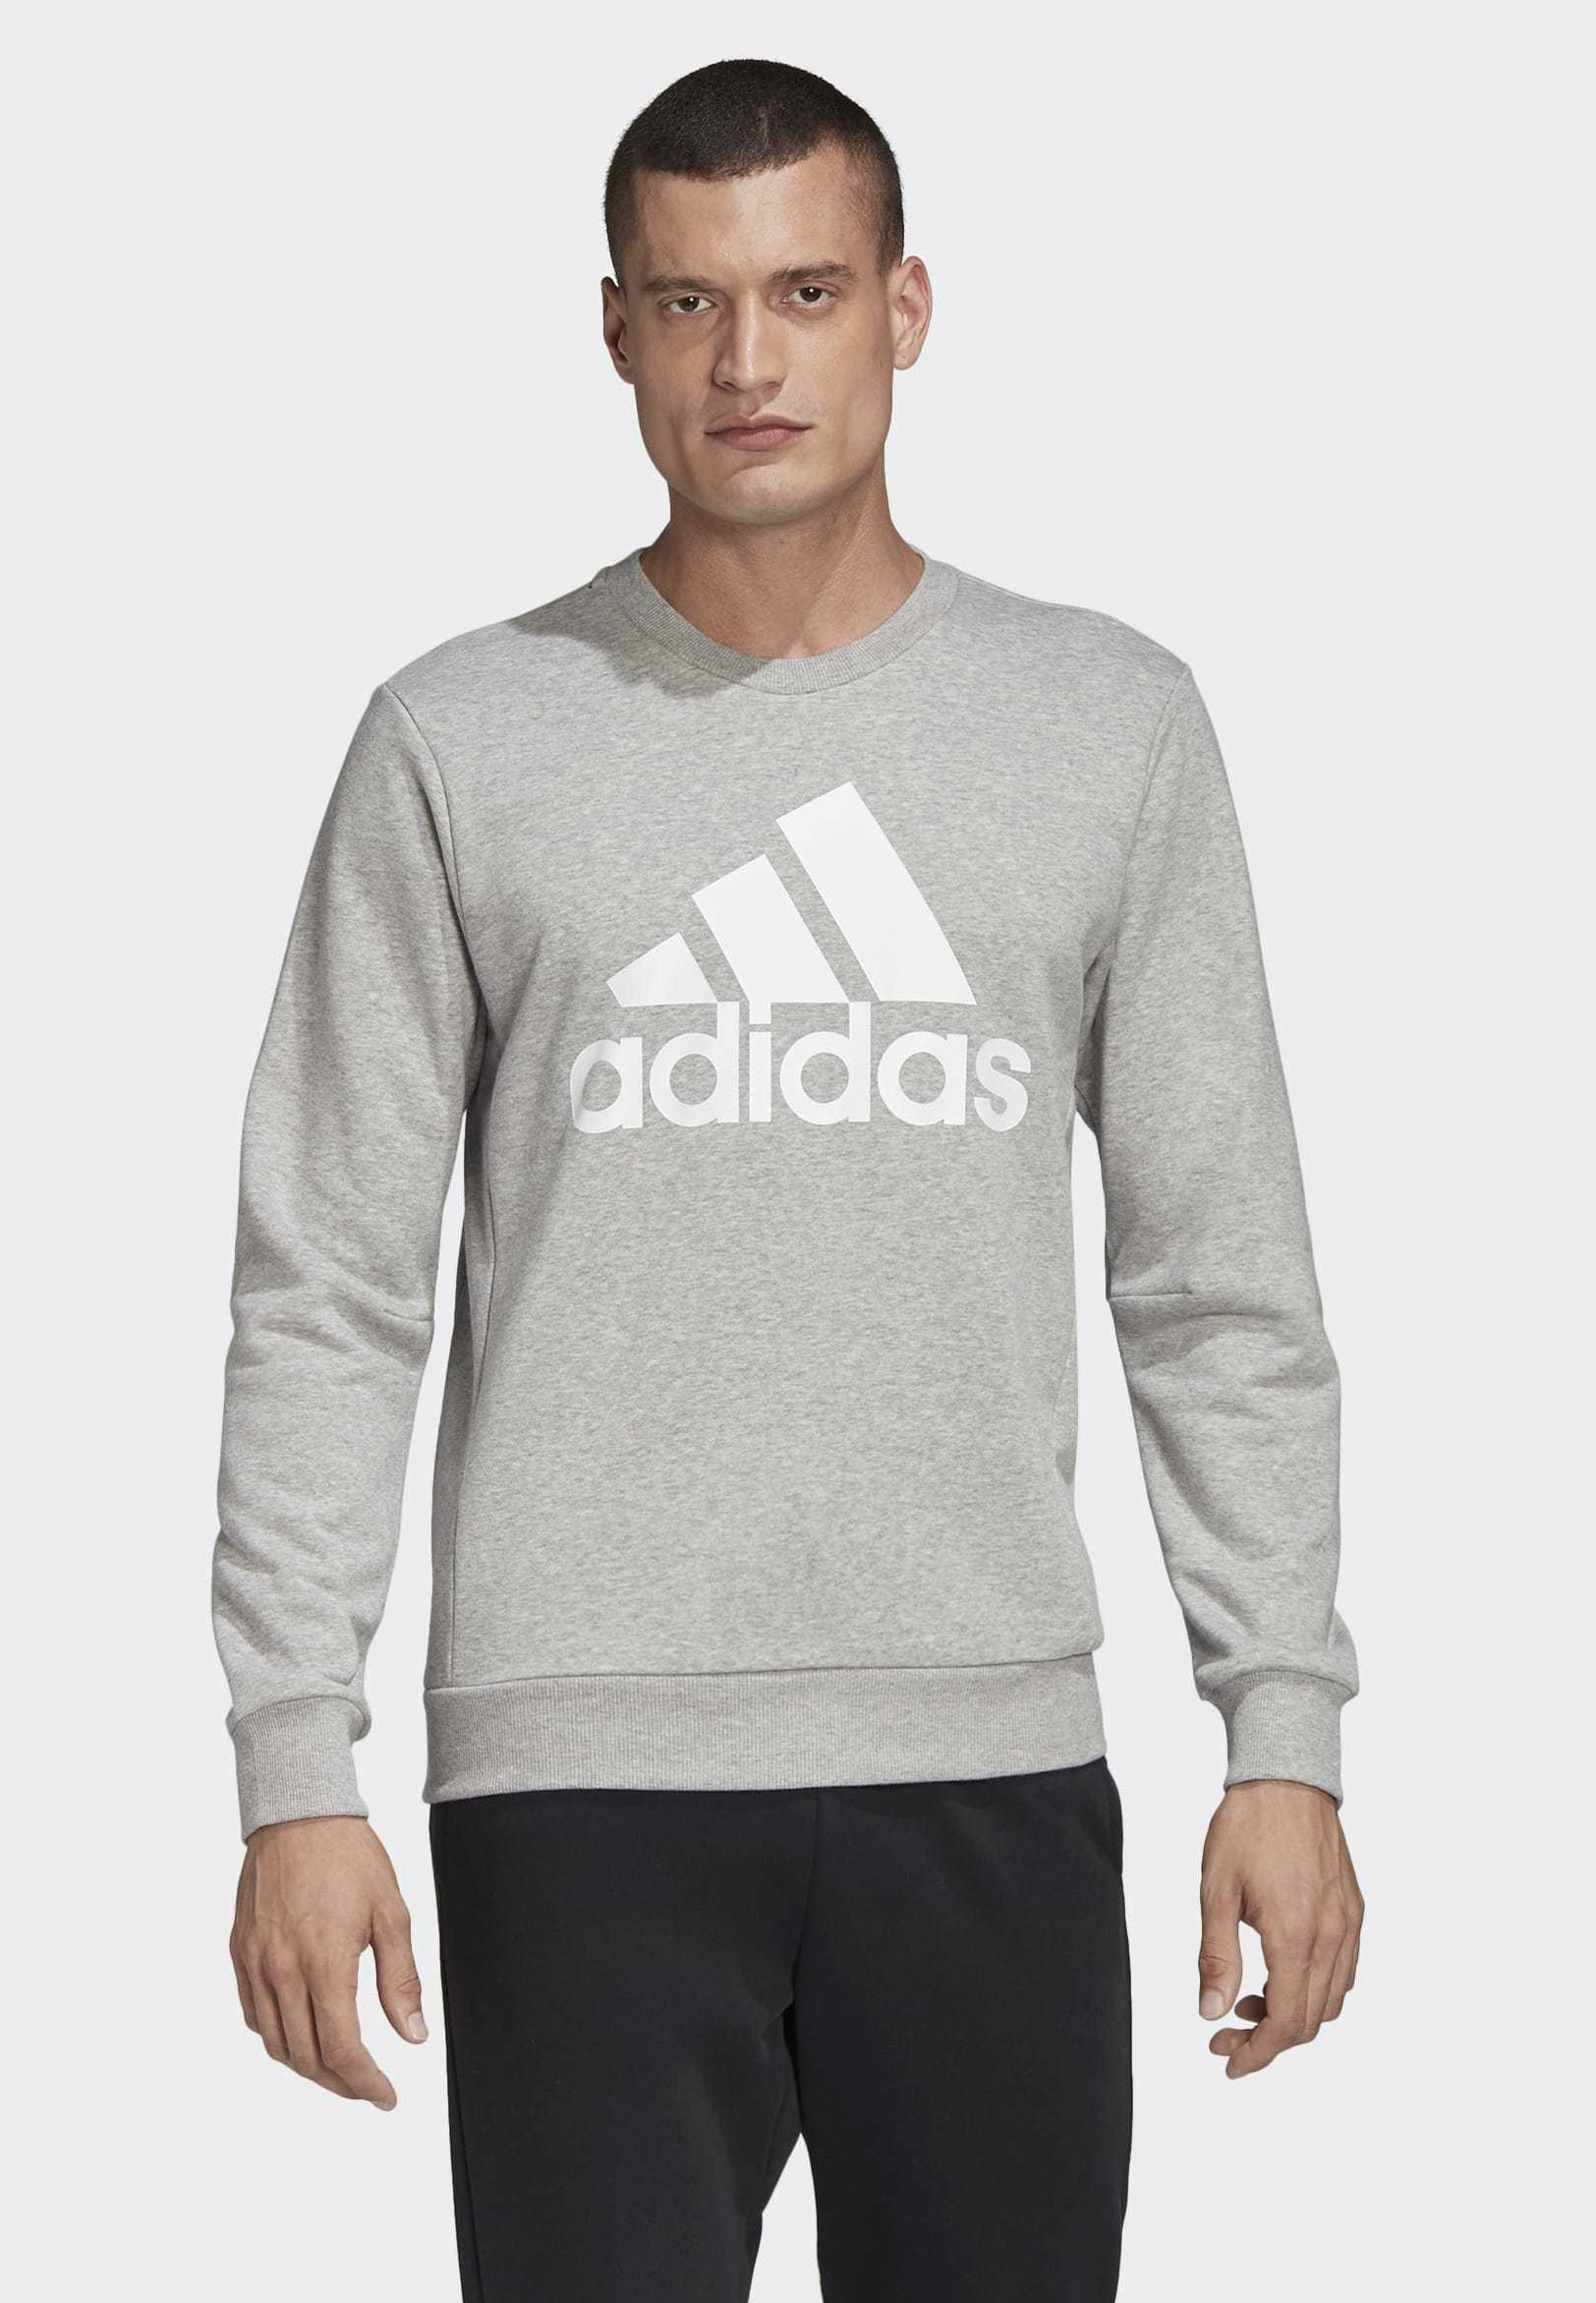 adidas Performance MUST HAVES BADGE OF SPORT CREW SWEATSHIRT - Sweatshirt - grey